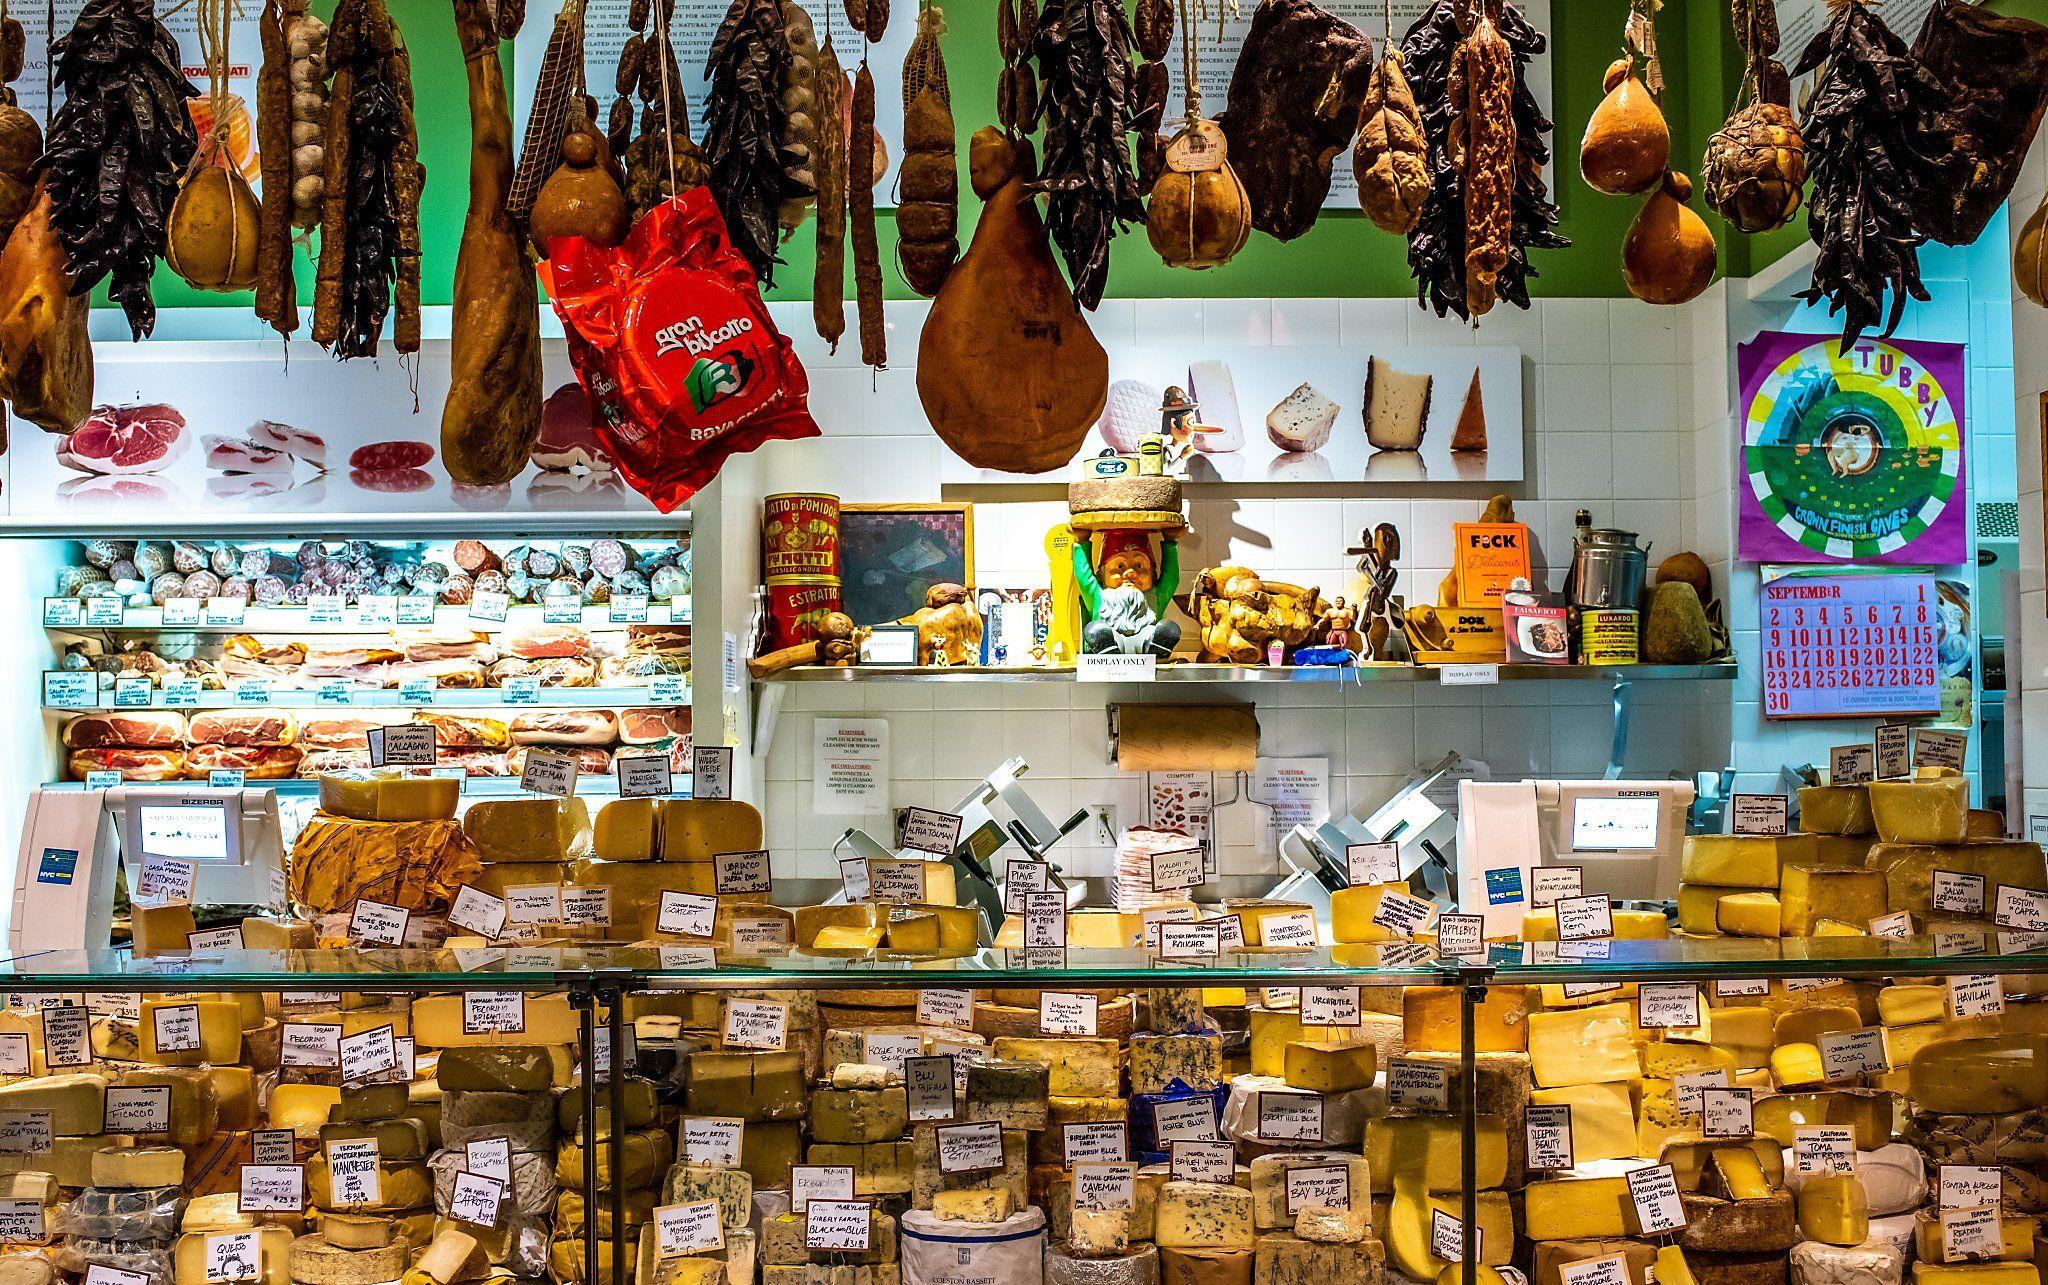 Eataly to open South Bay Italian food emporium Valley